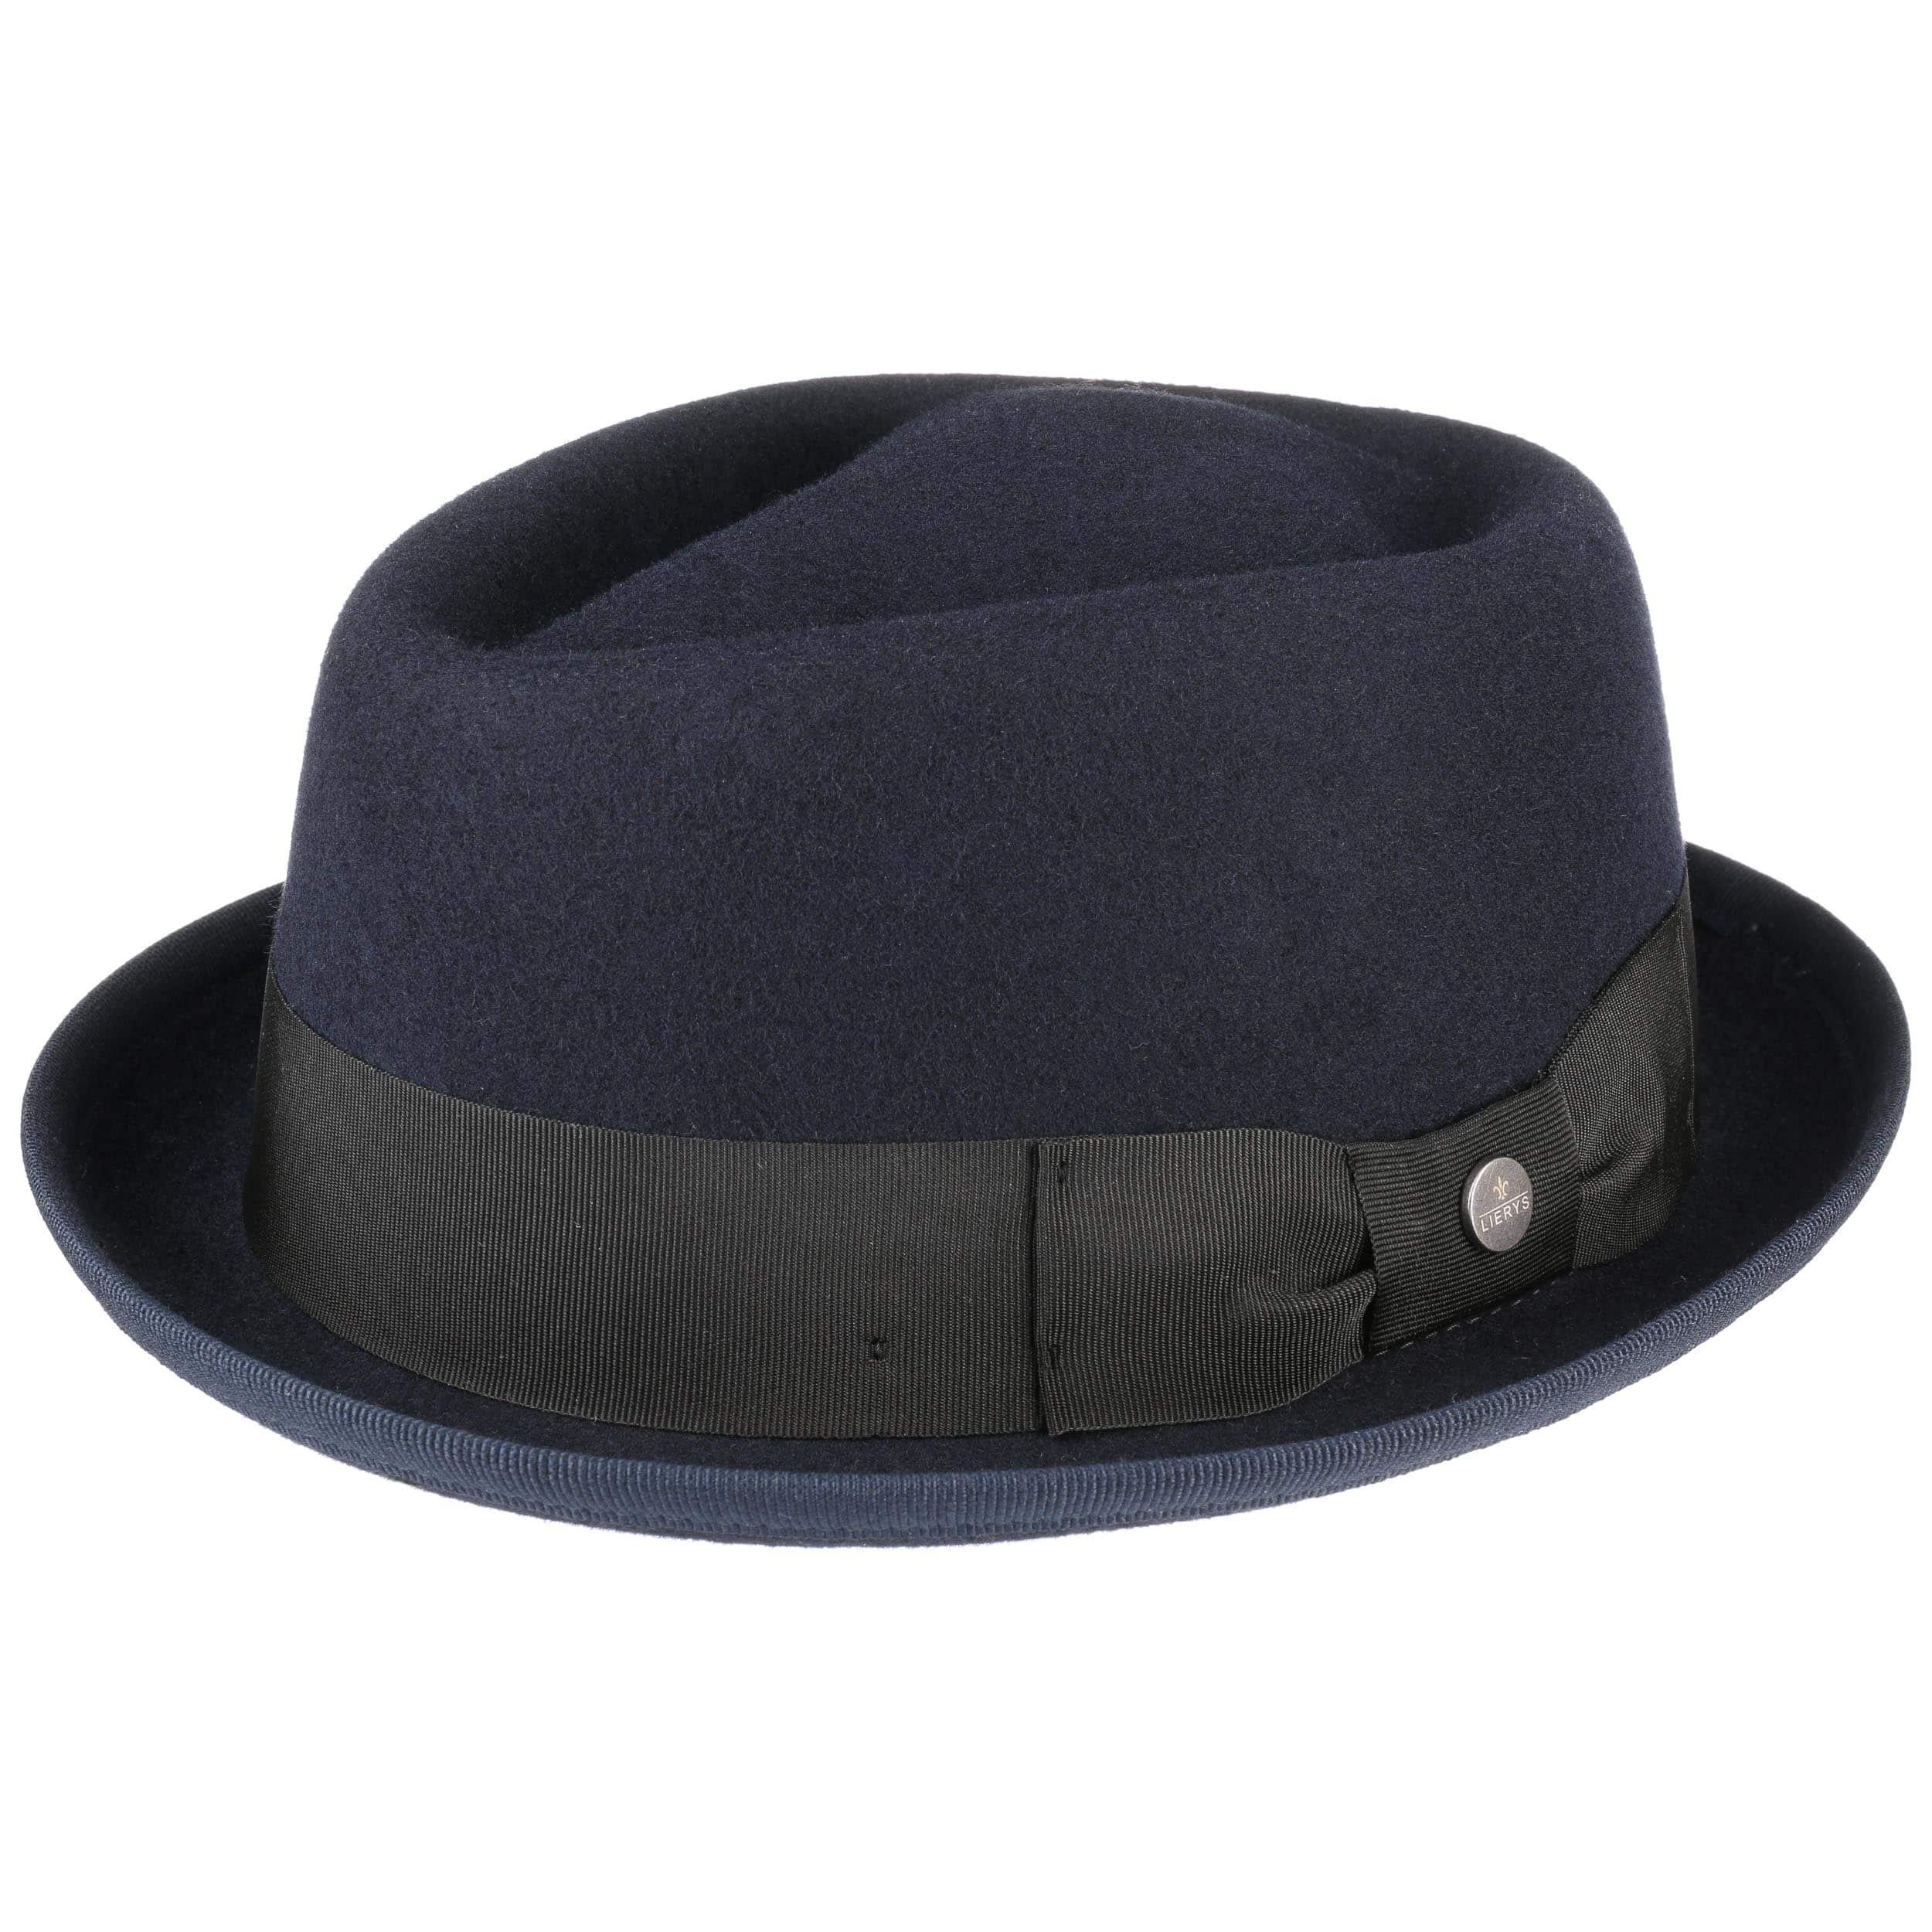 053f5371e9982 Blue Fedora Pork Pie Hat by Lierys - 64,95 £